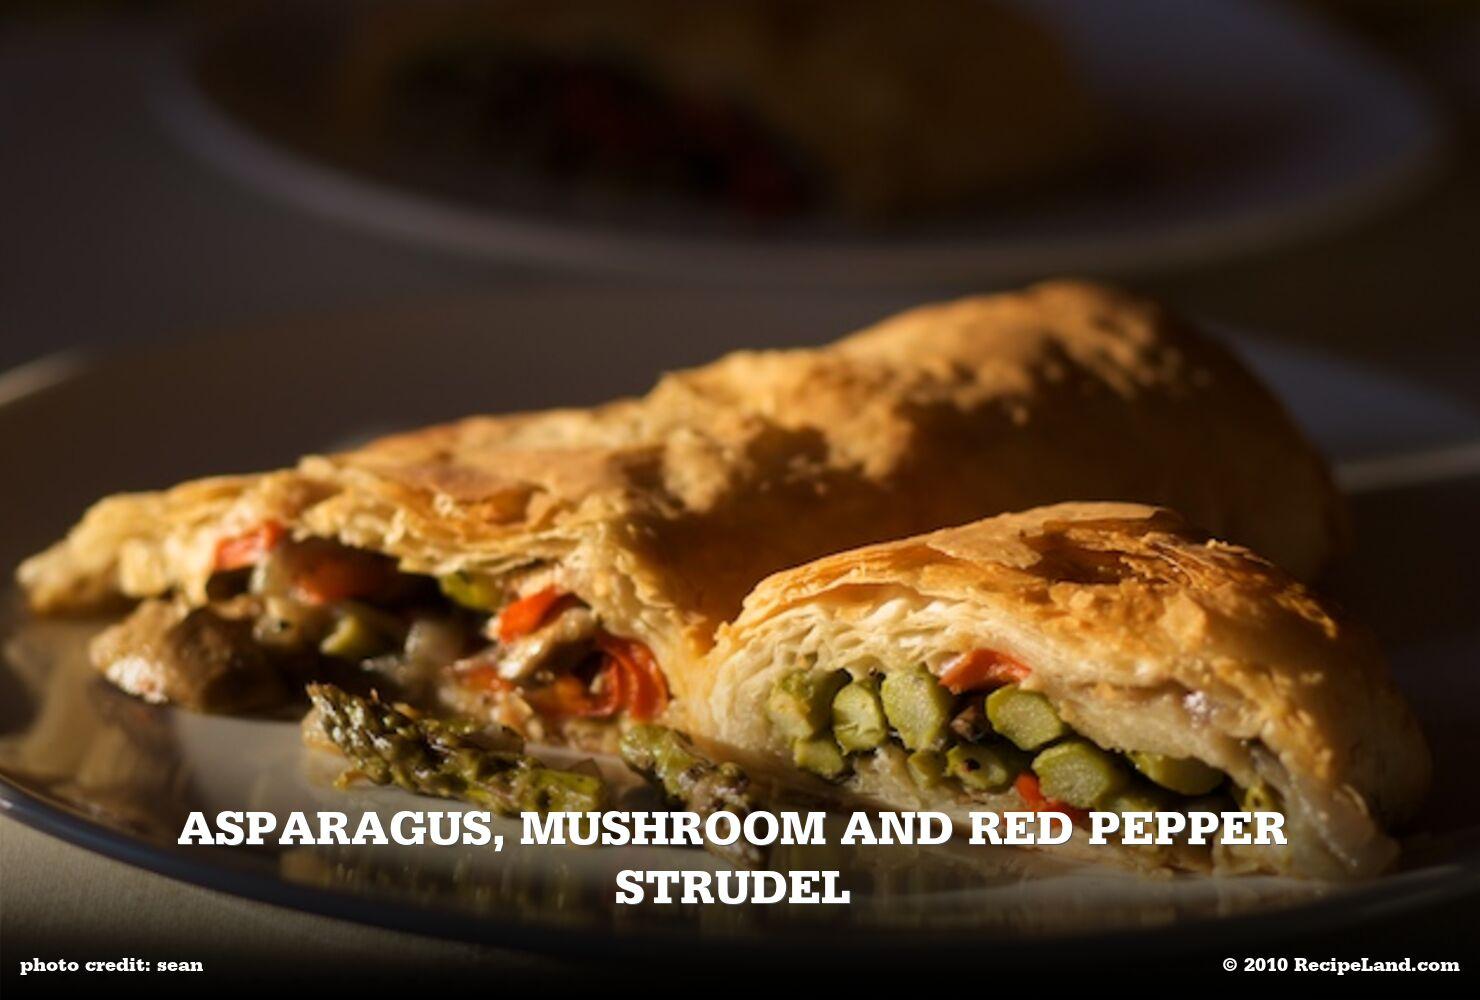 Asparagus, Mushroom and Red Pepper Strudel